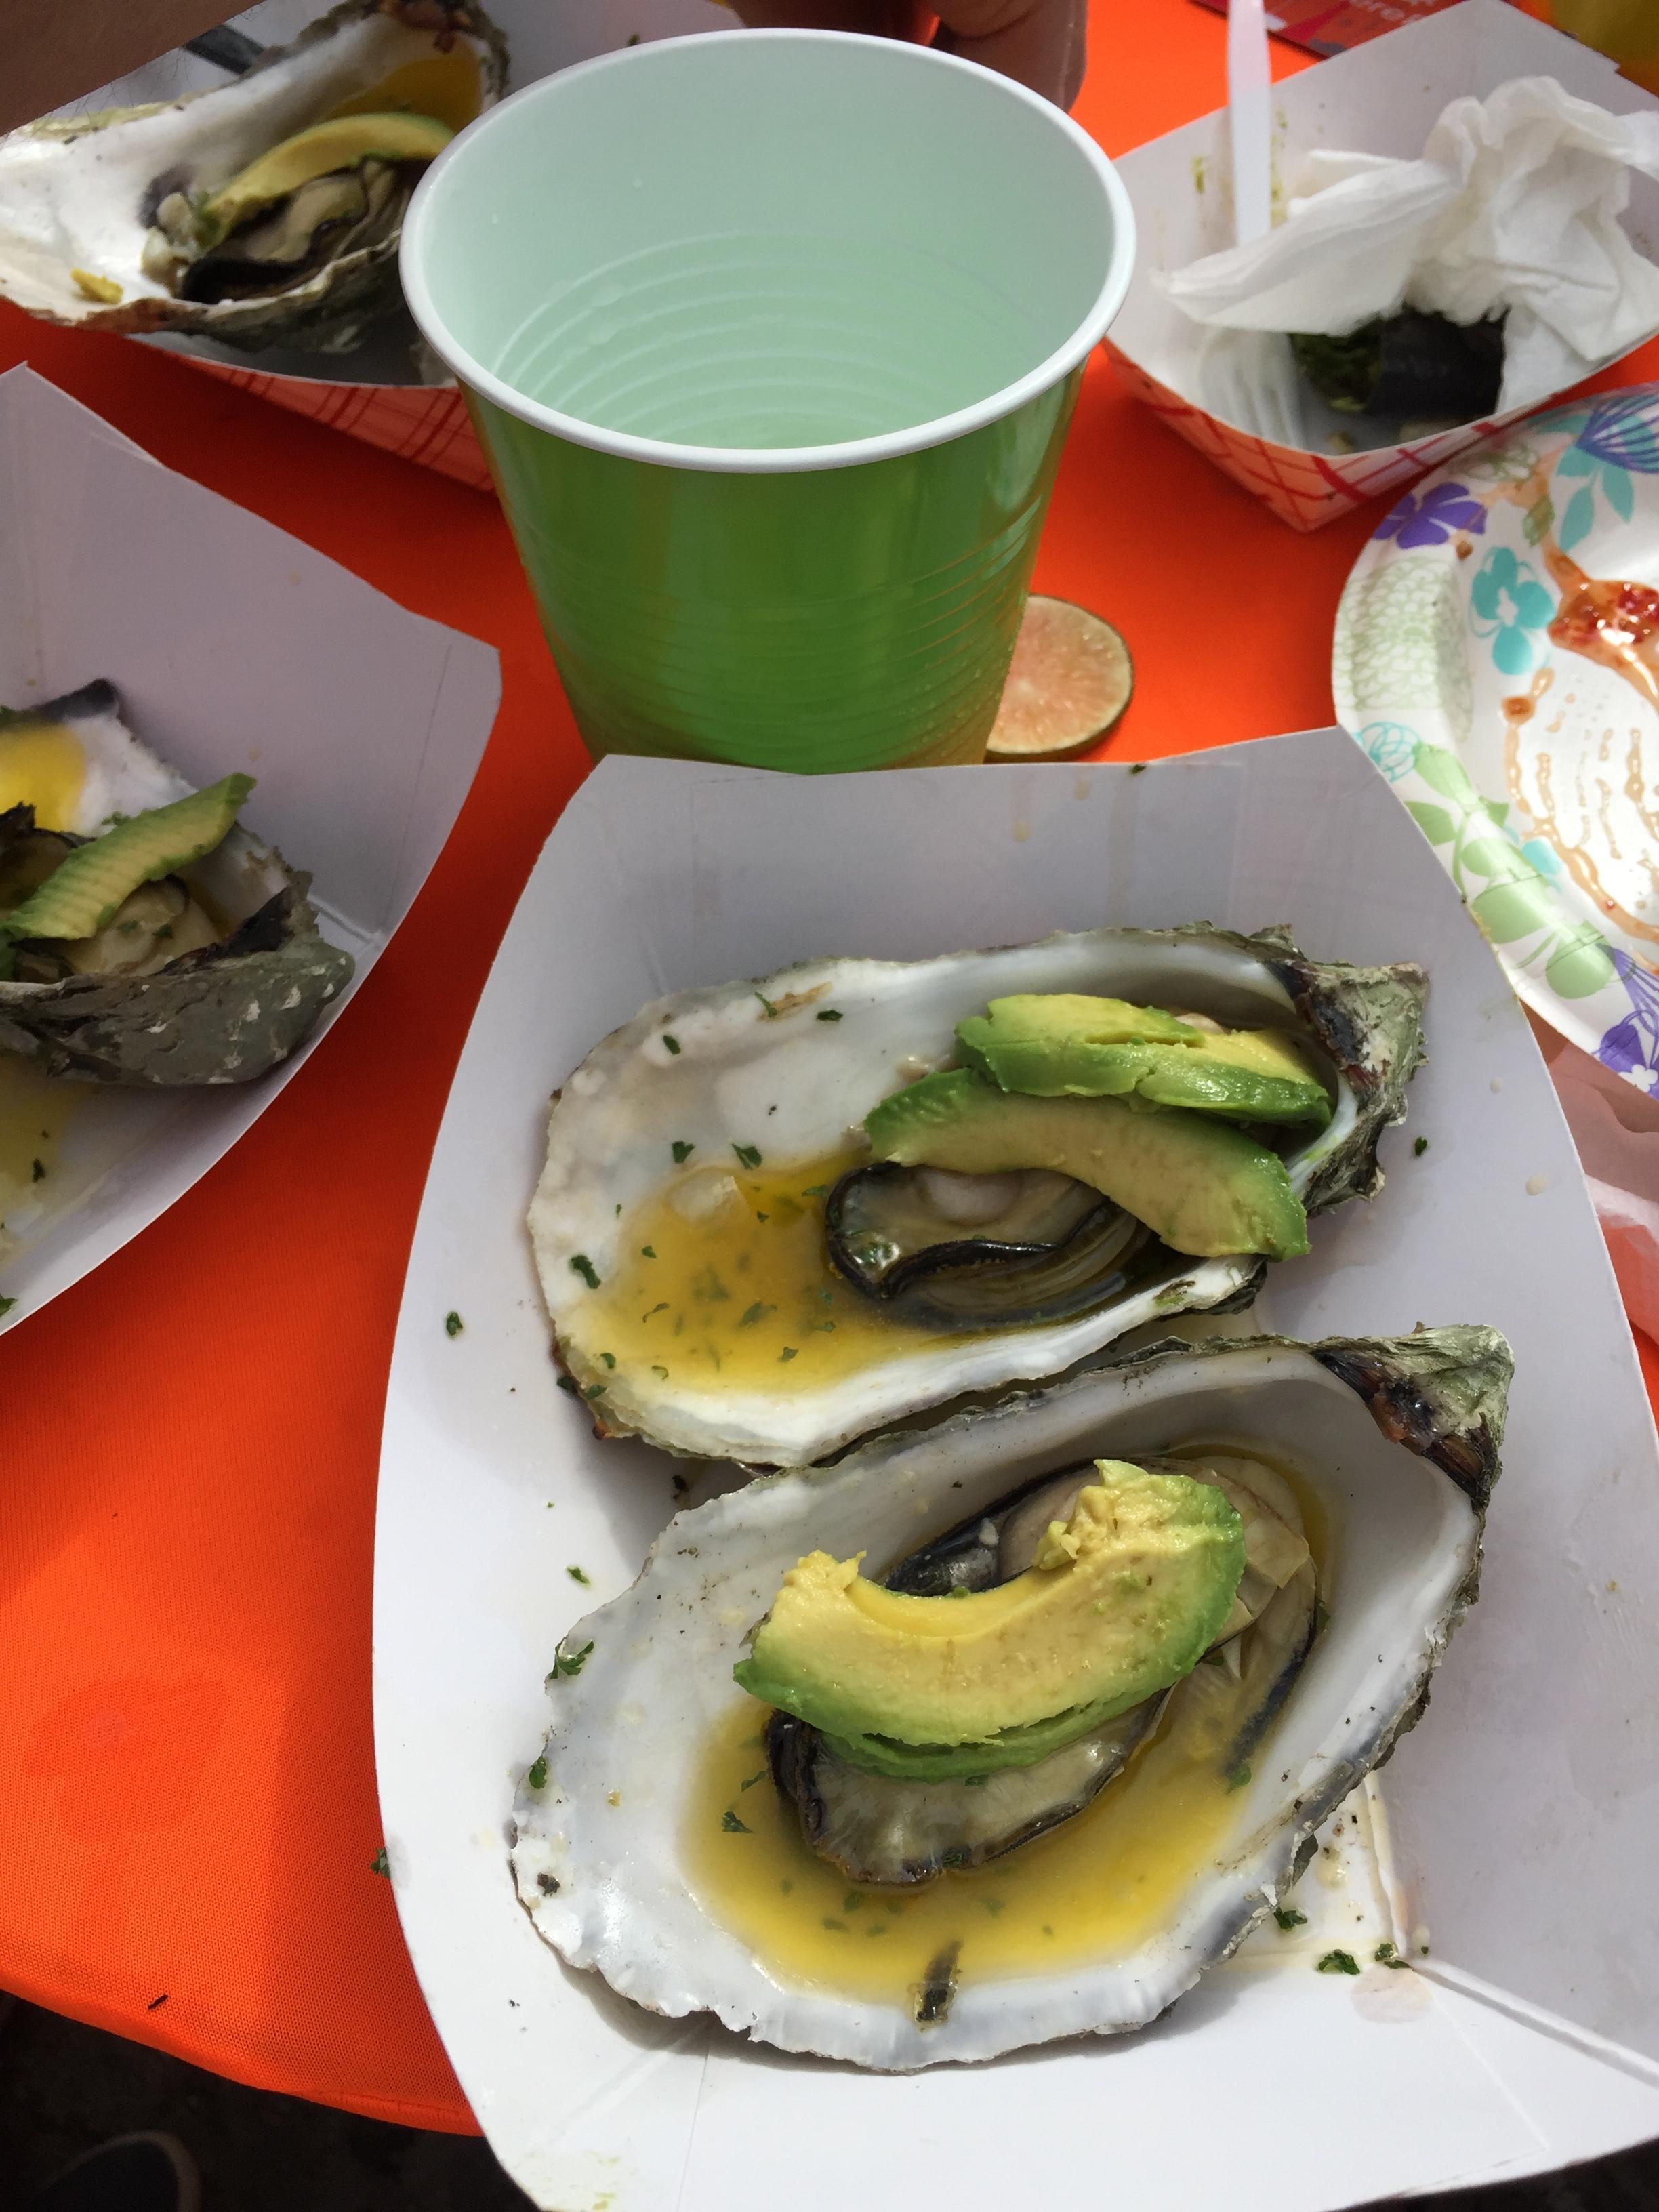 Avocado & Margarita Festival anyone? Local cuisine n Morro Bay, CA.